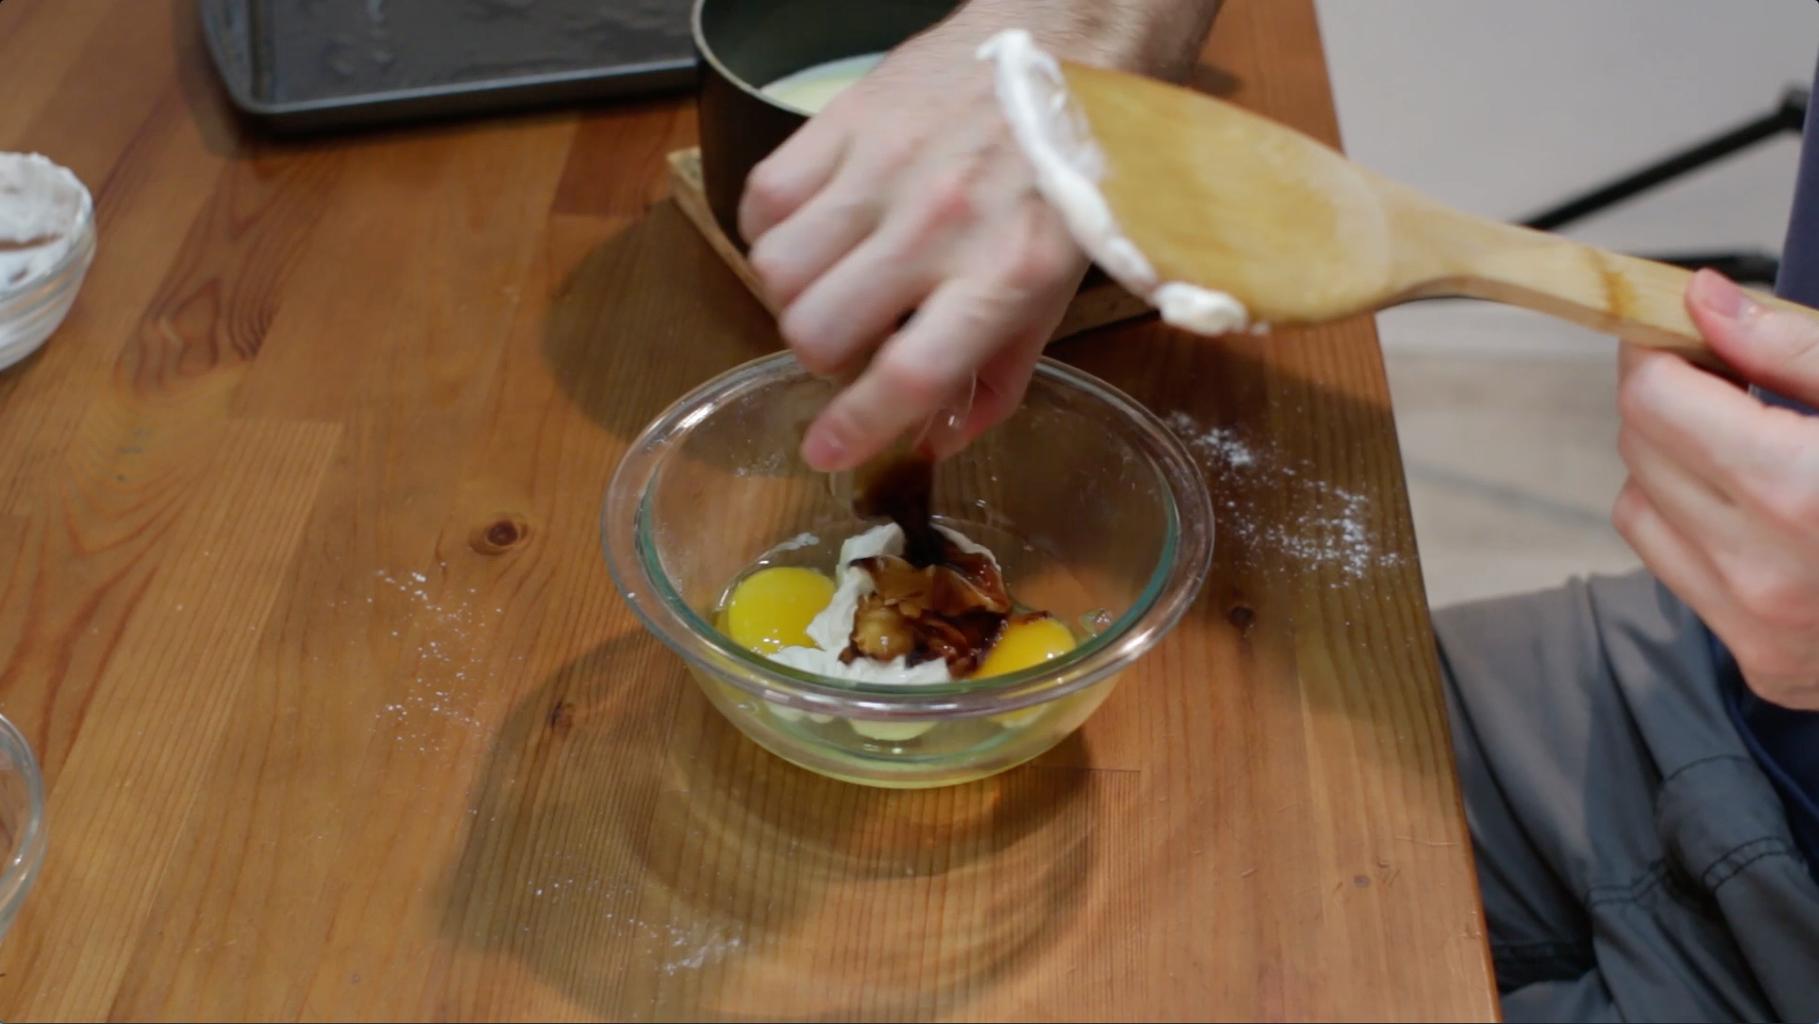 Eggs and Sour Cream